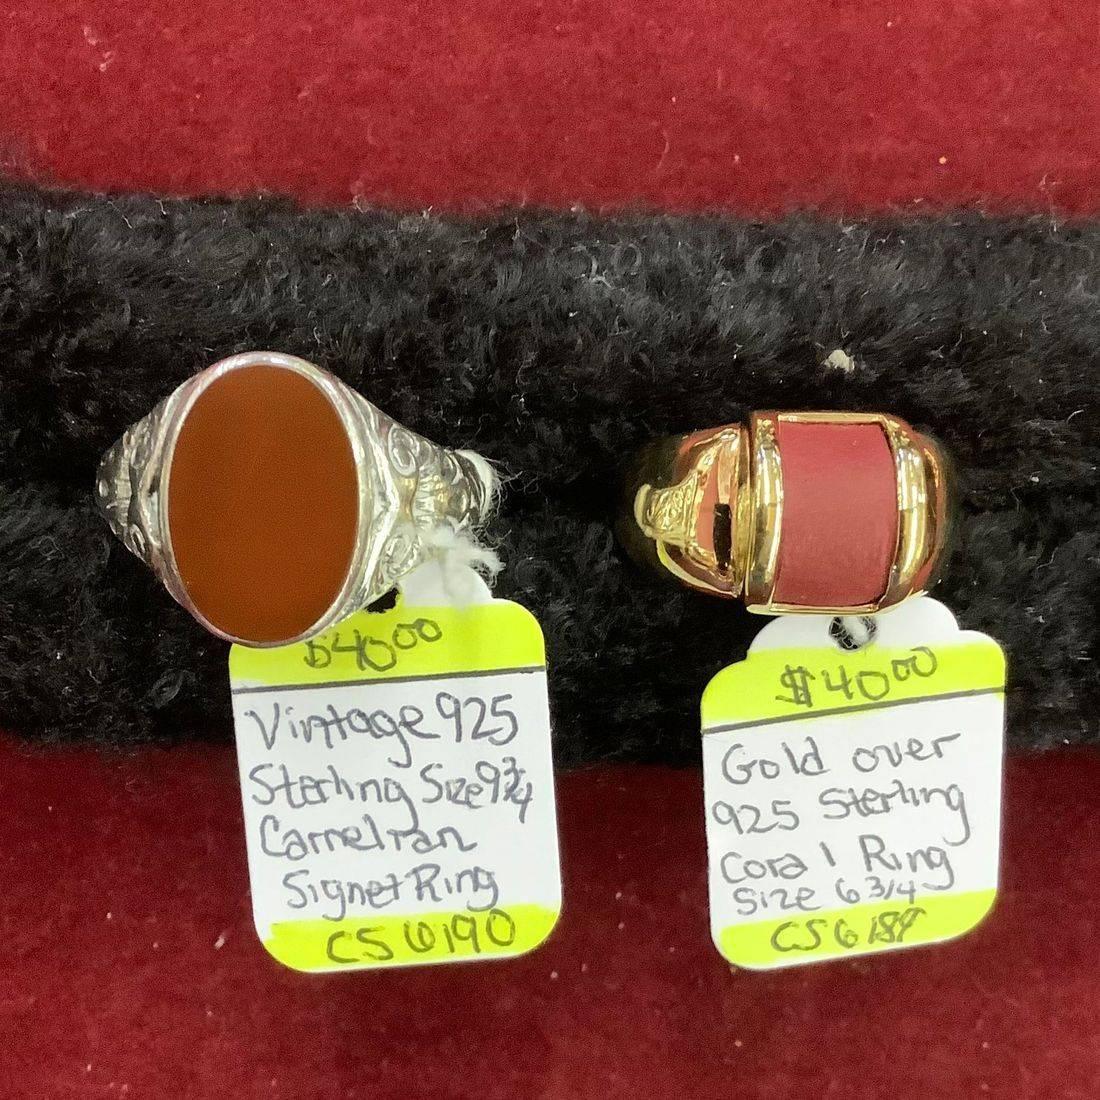 Vintage Sterling Carnelian size 9-3/4 Signet Ring $40 , Gold over Sterling Coral size 6-3/4 Ring $40